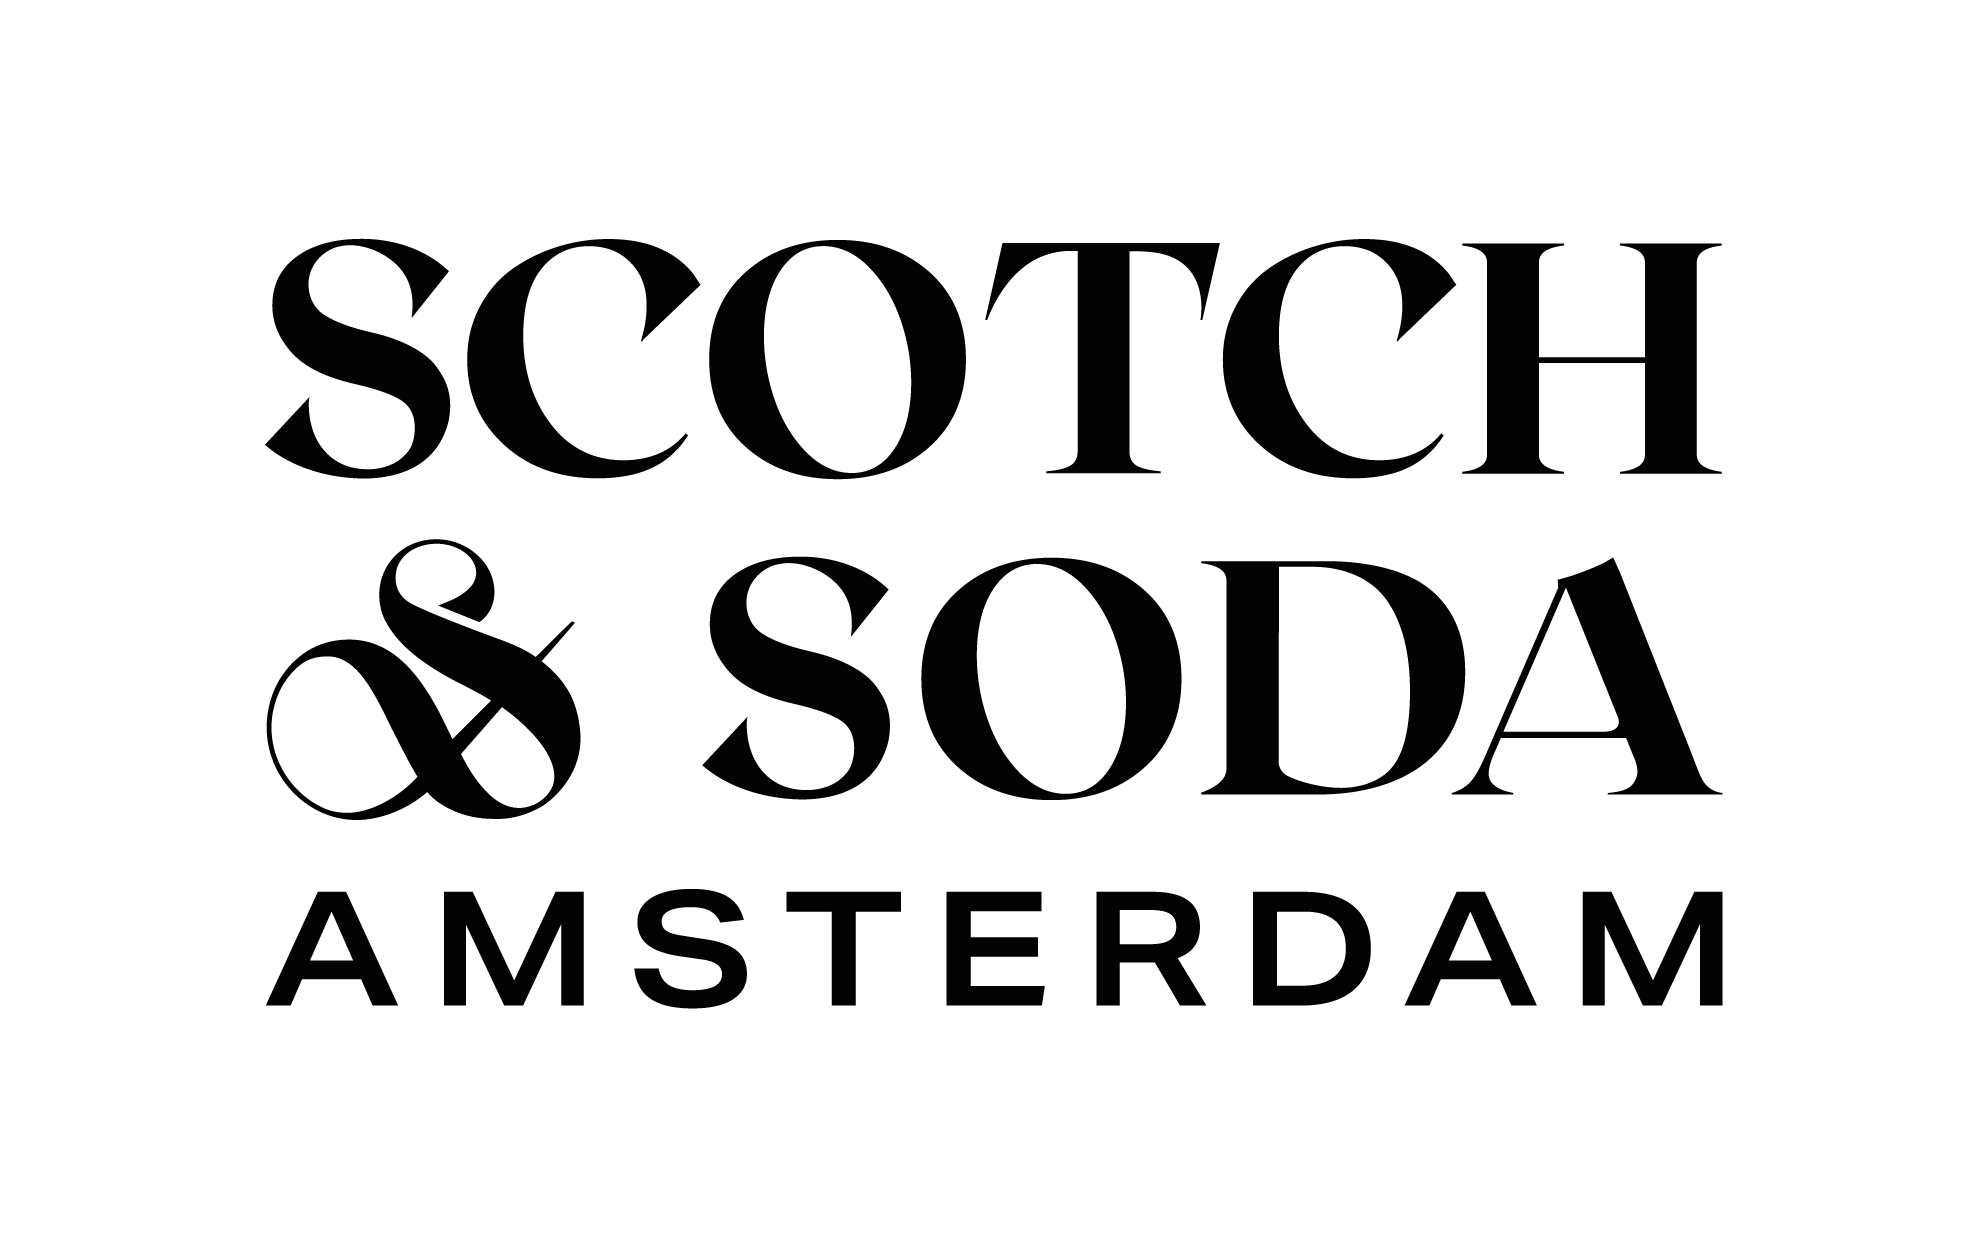 Scotch & Soda (US) Spring banner